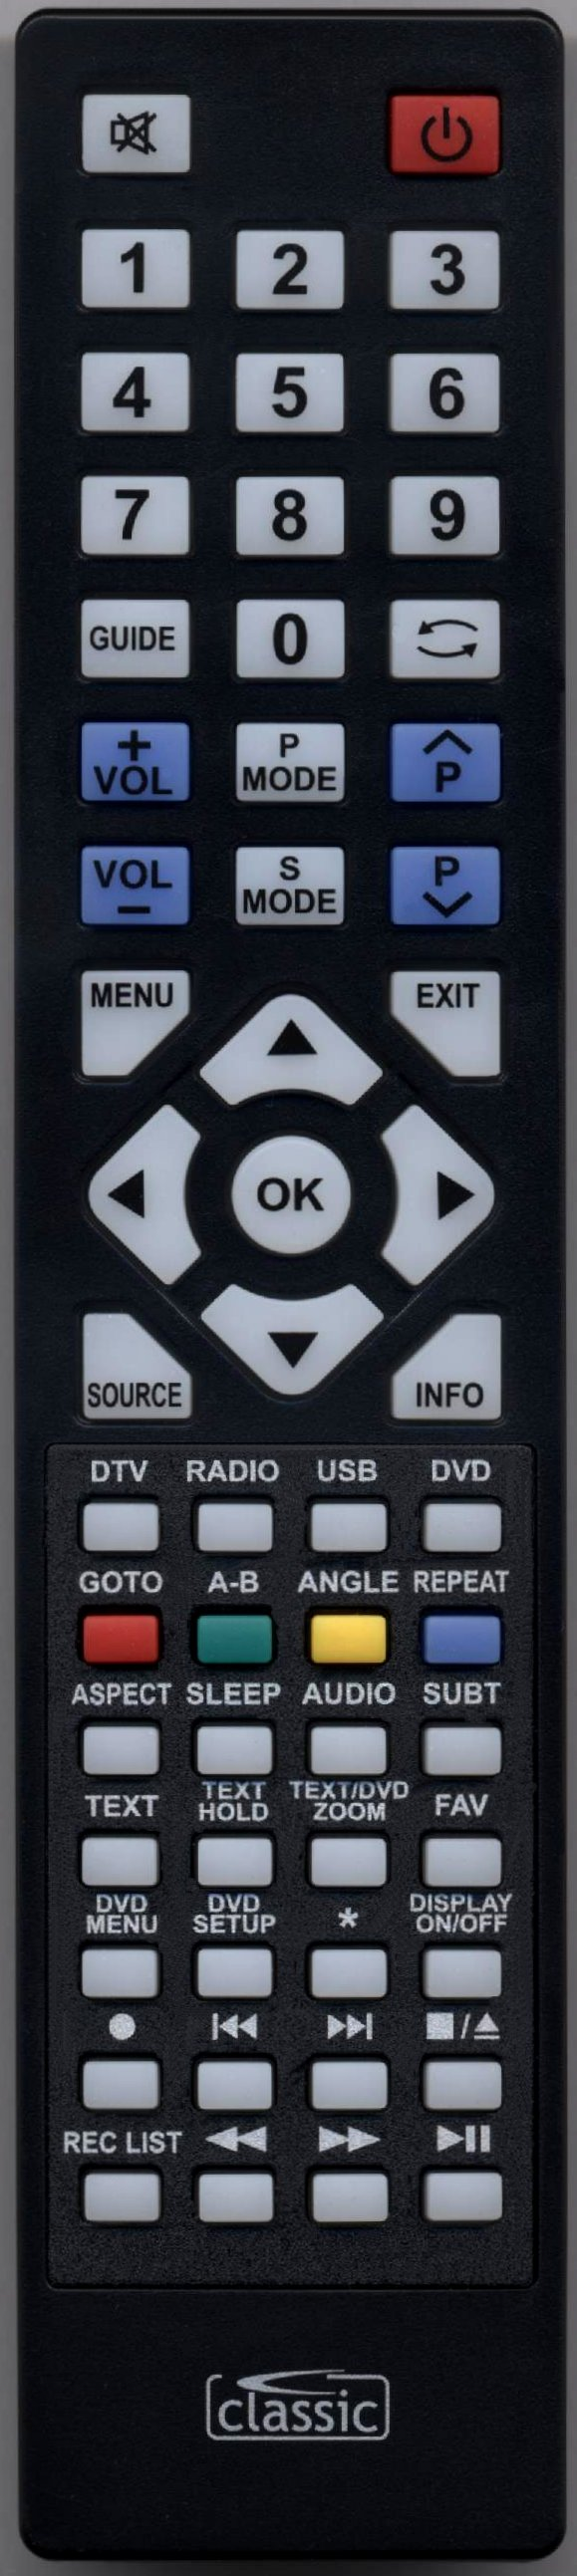 BLAUPUNKT 32/148Z-GB-11B-GU-UK Remote Control